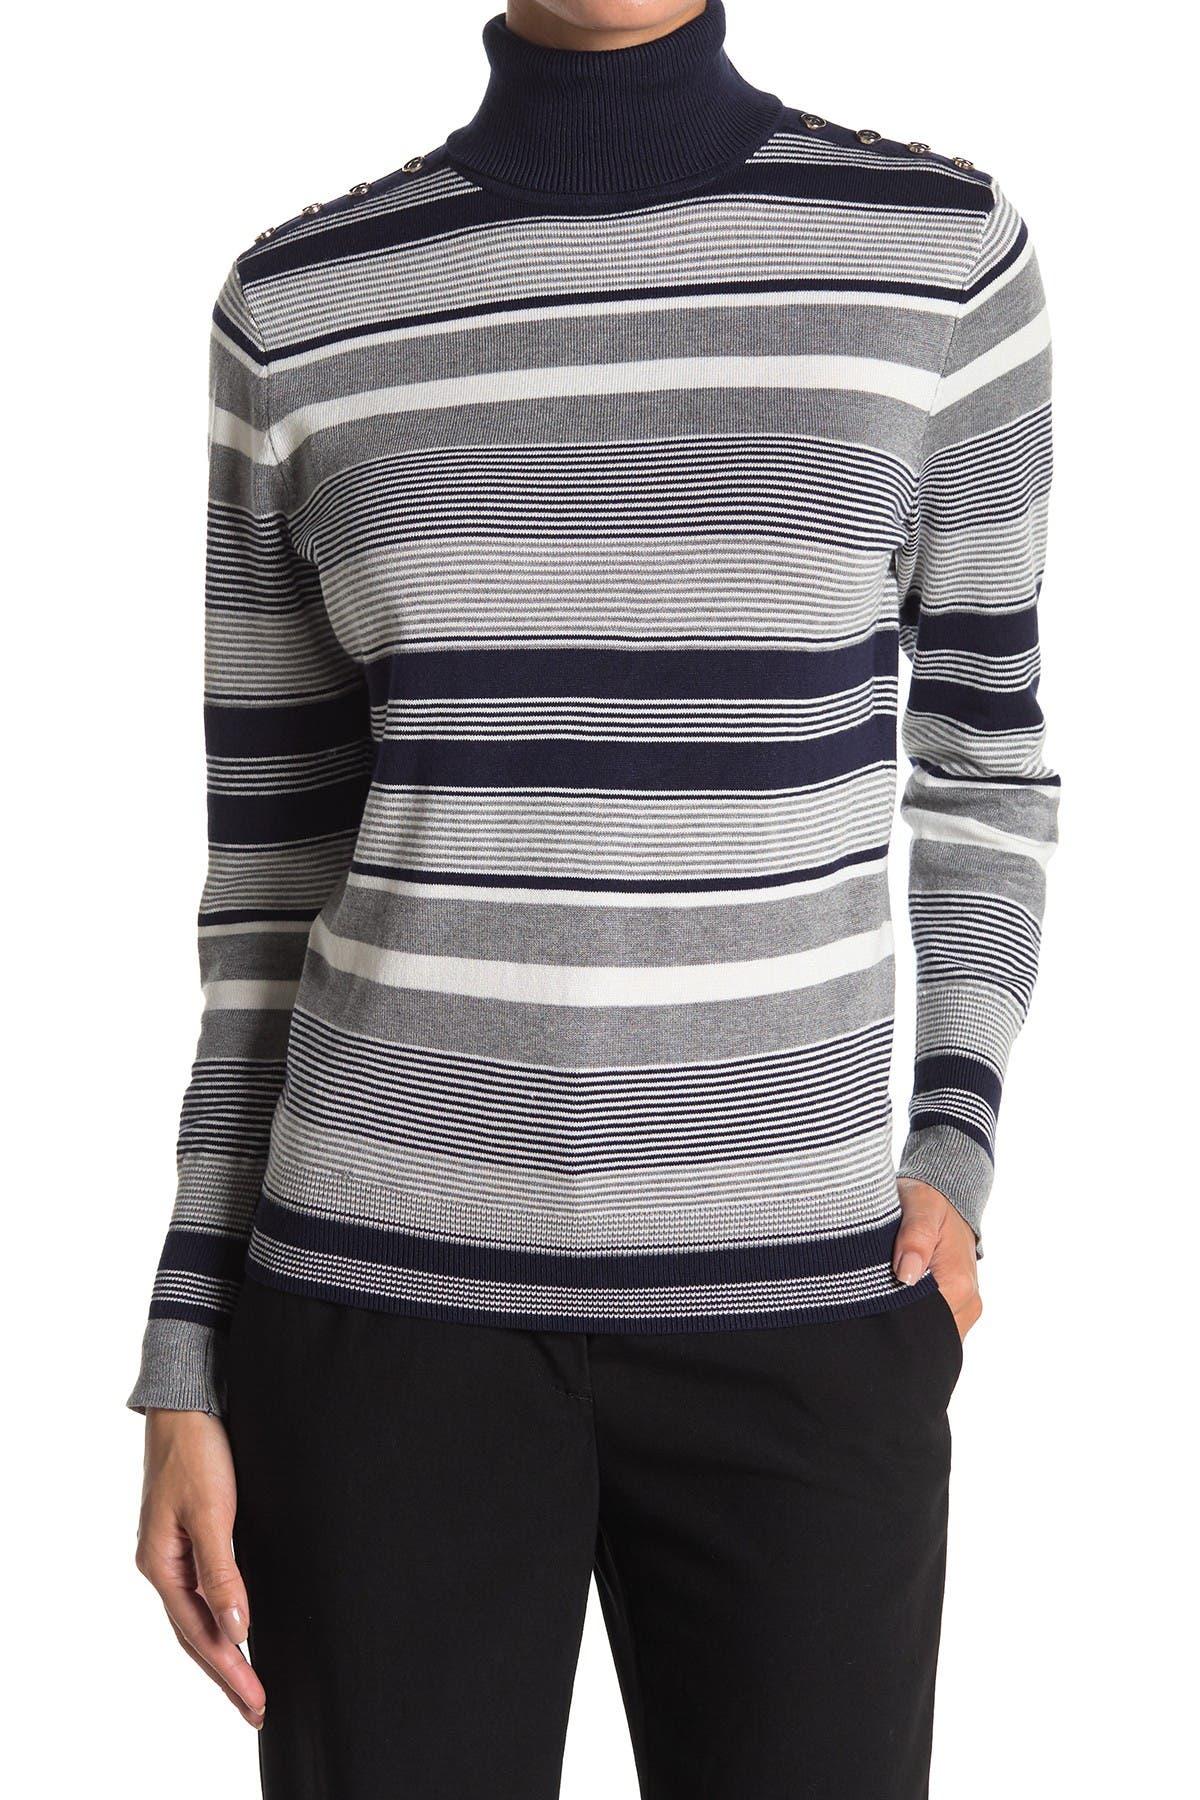 Image of JOSEPH A Striped Turtleneck Sweater